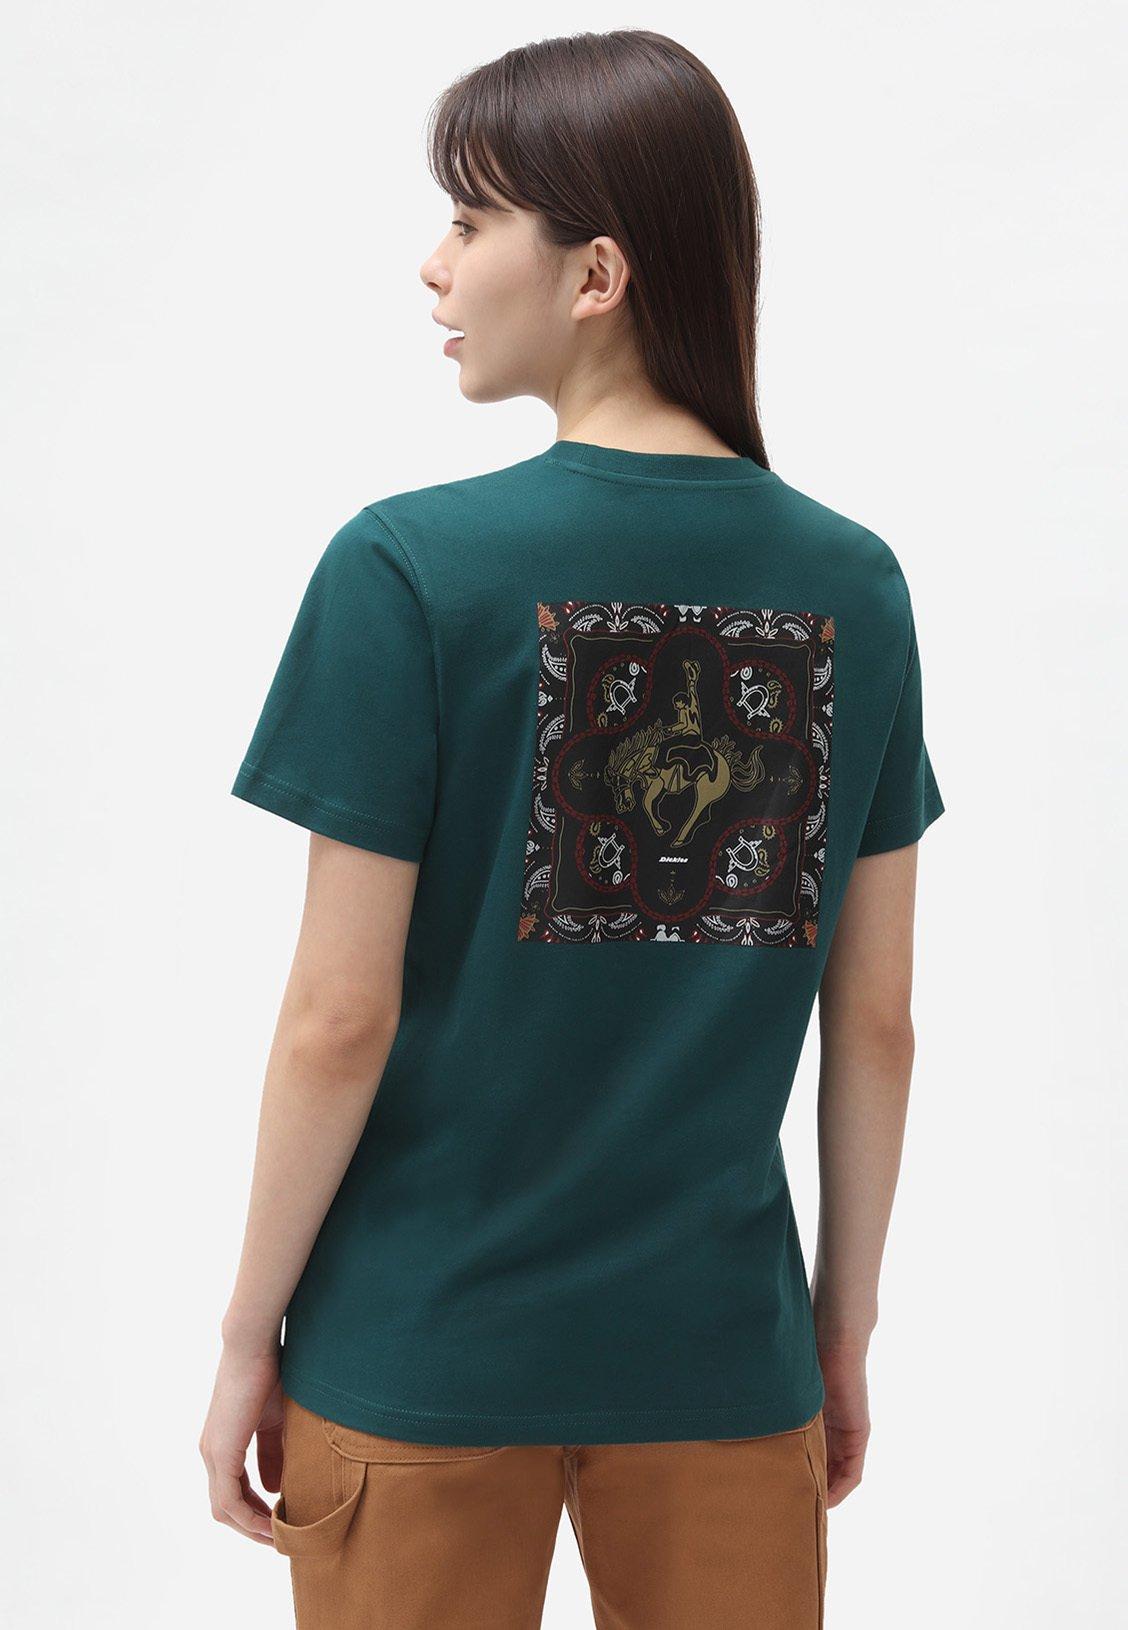 Donna REWORKED - T-shirt con stampa